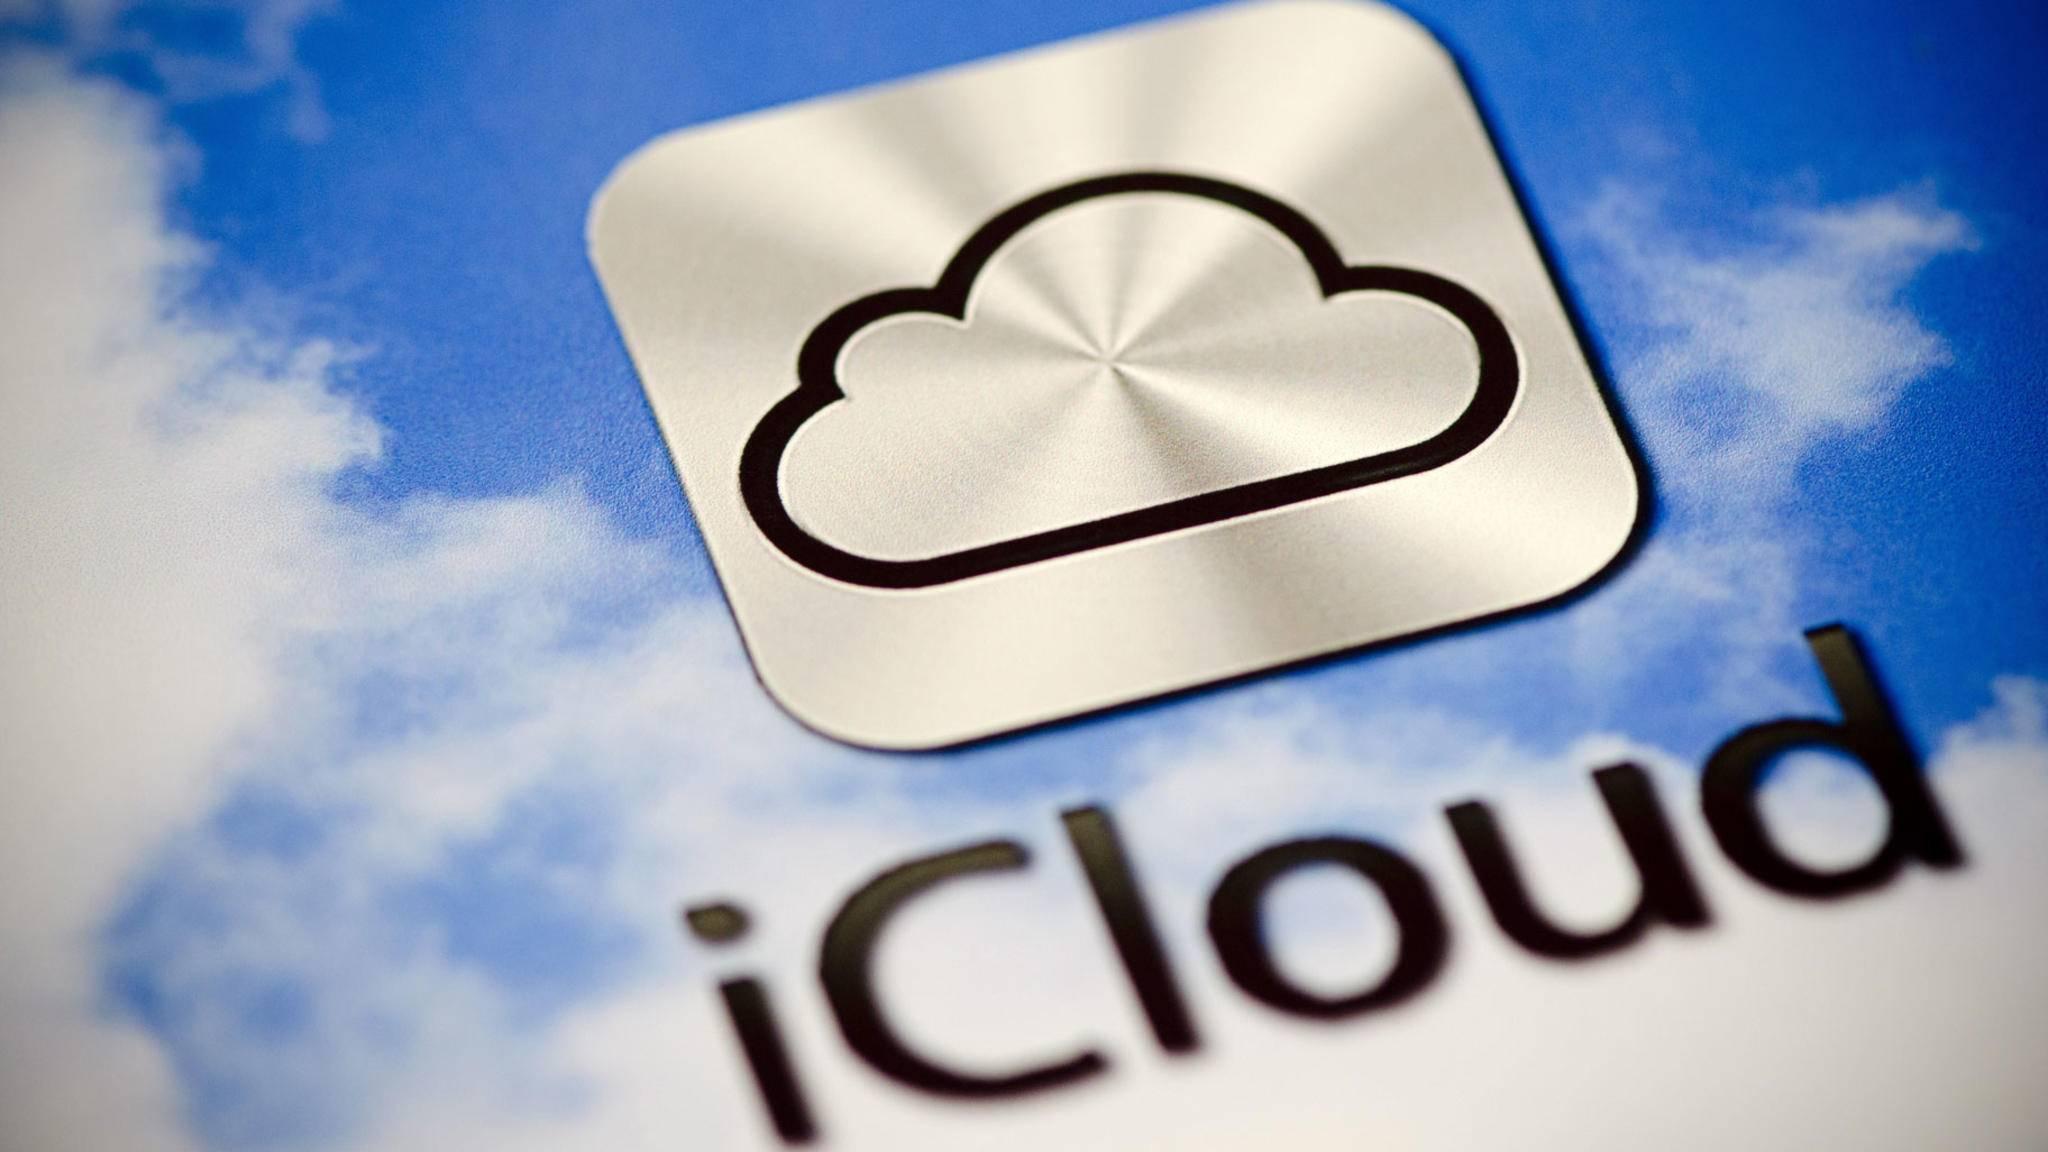 Zu wenig iCloud-Speicher? Dann entferne doch das iCloud-Backups.